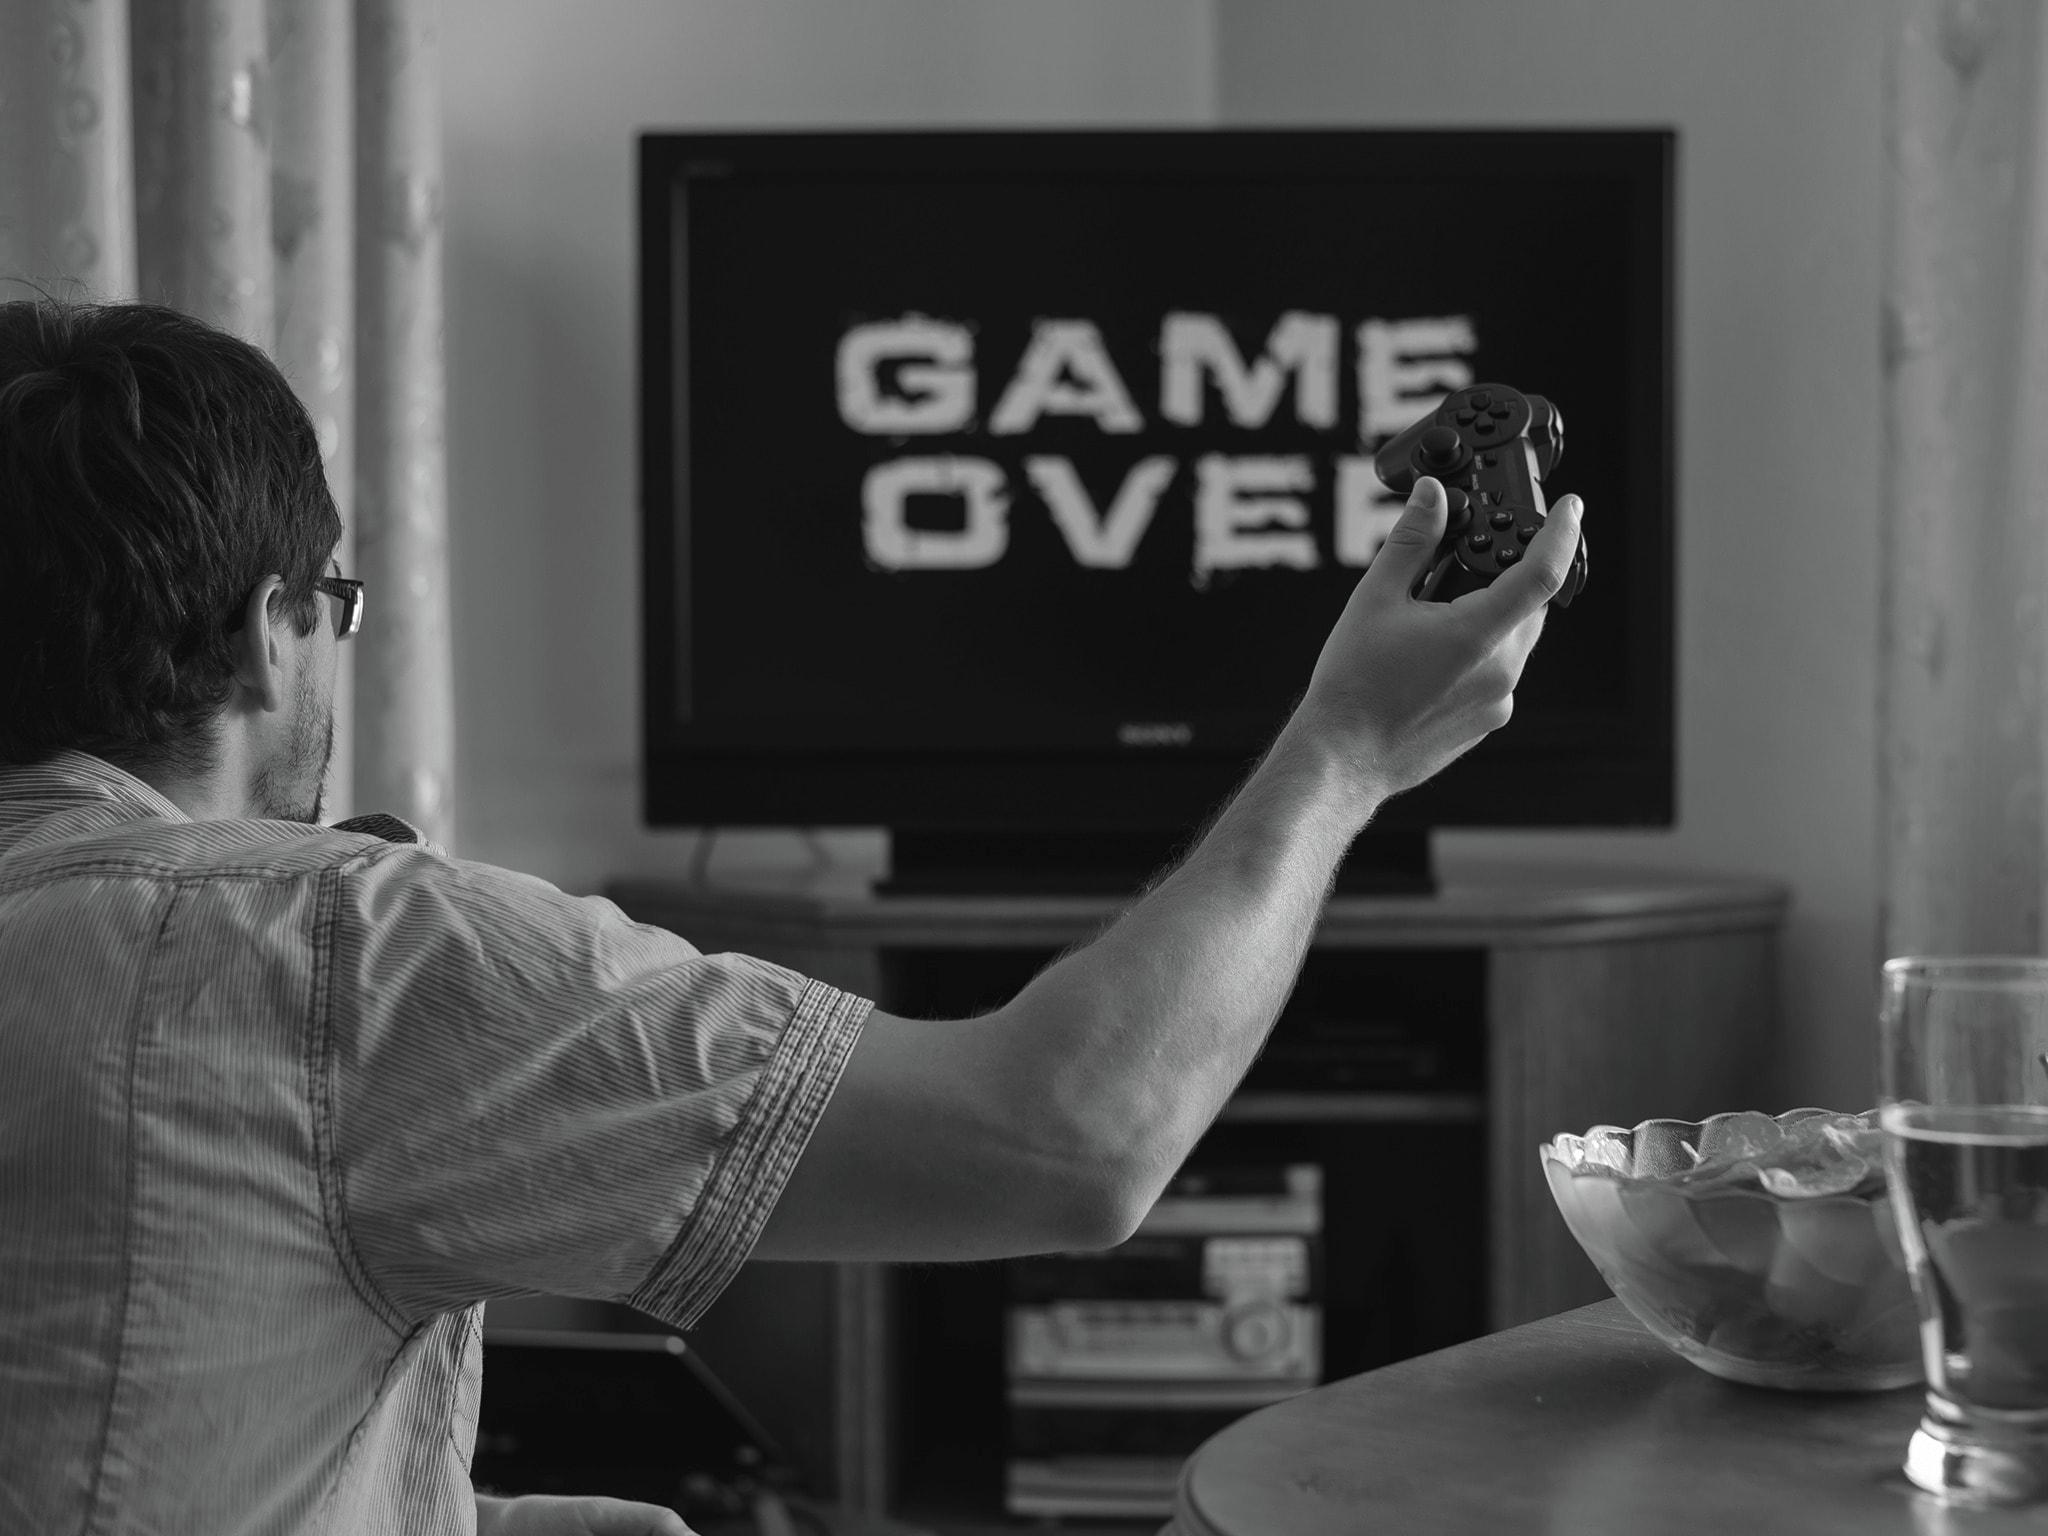 Man_looking_at_gameover_screen